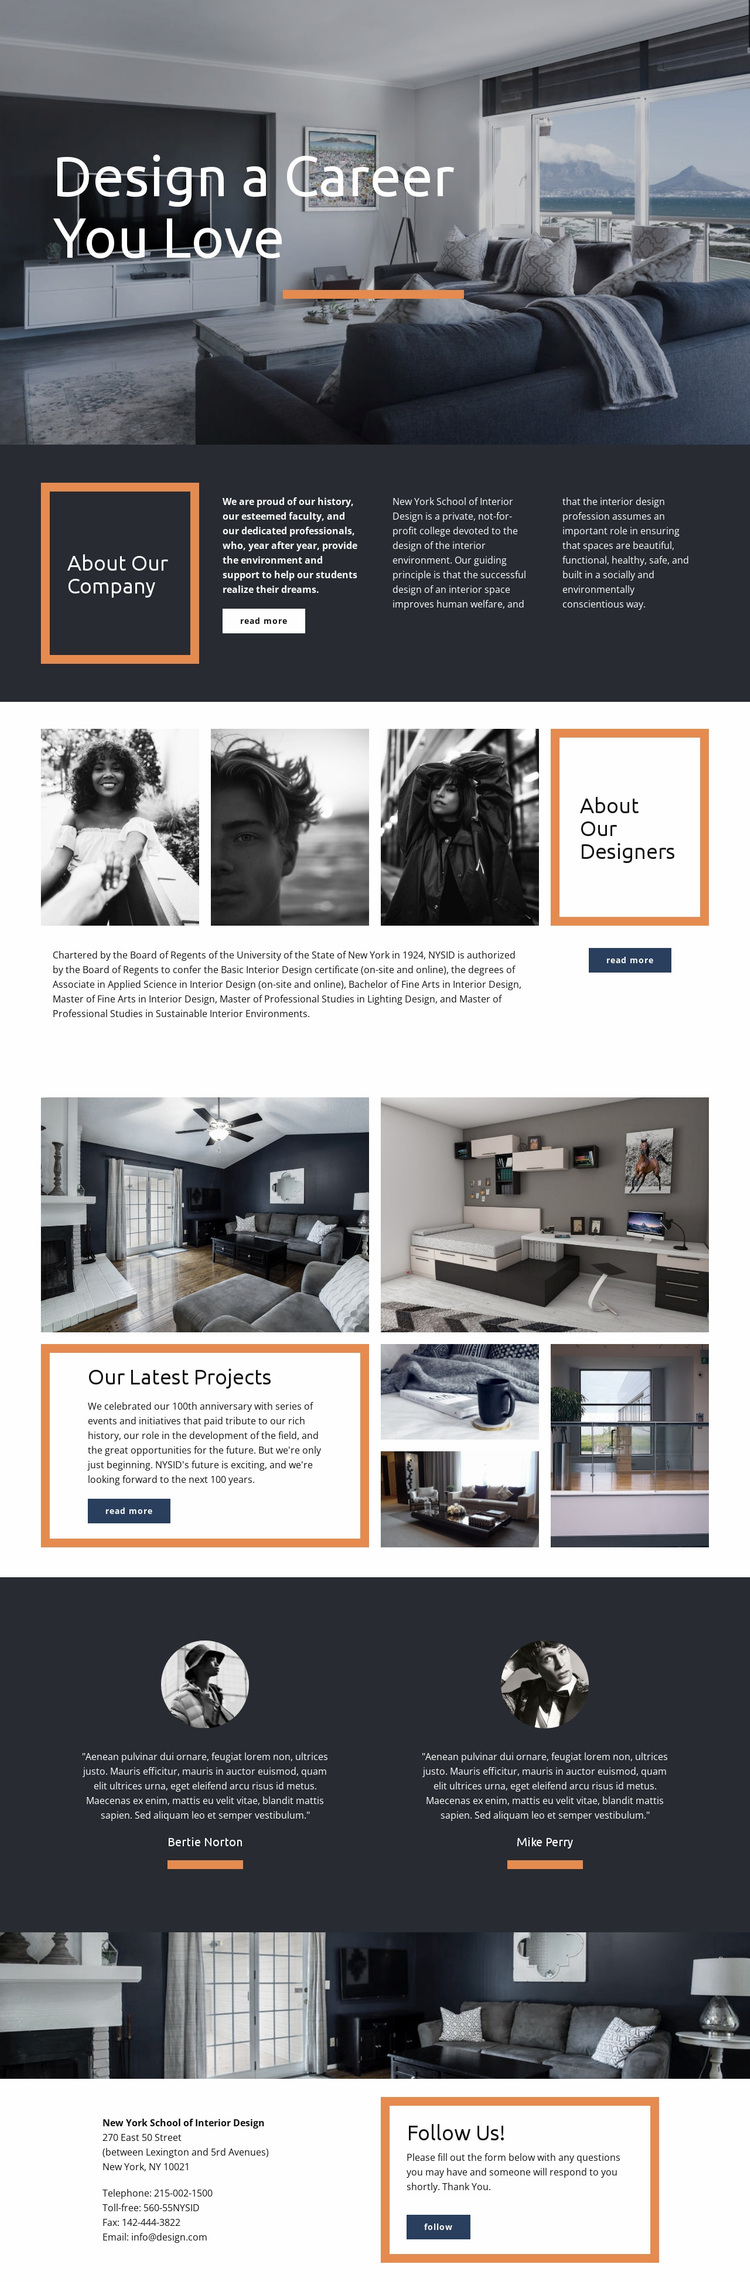 Design a Career You Love Website Design